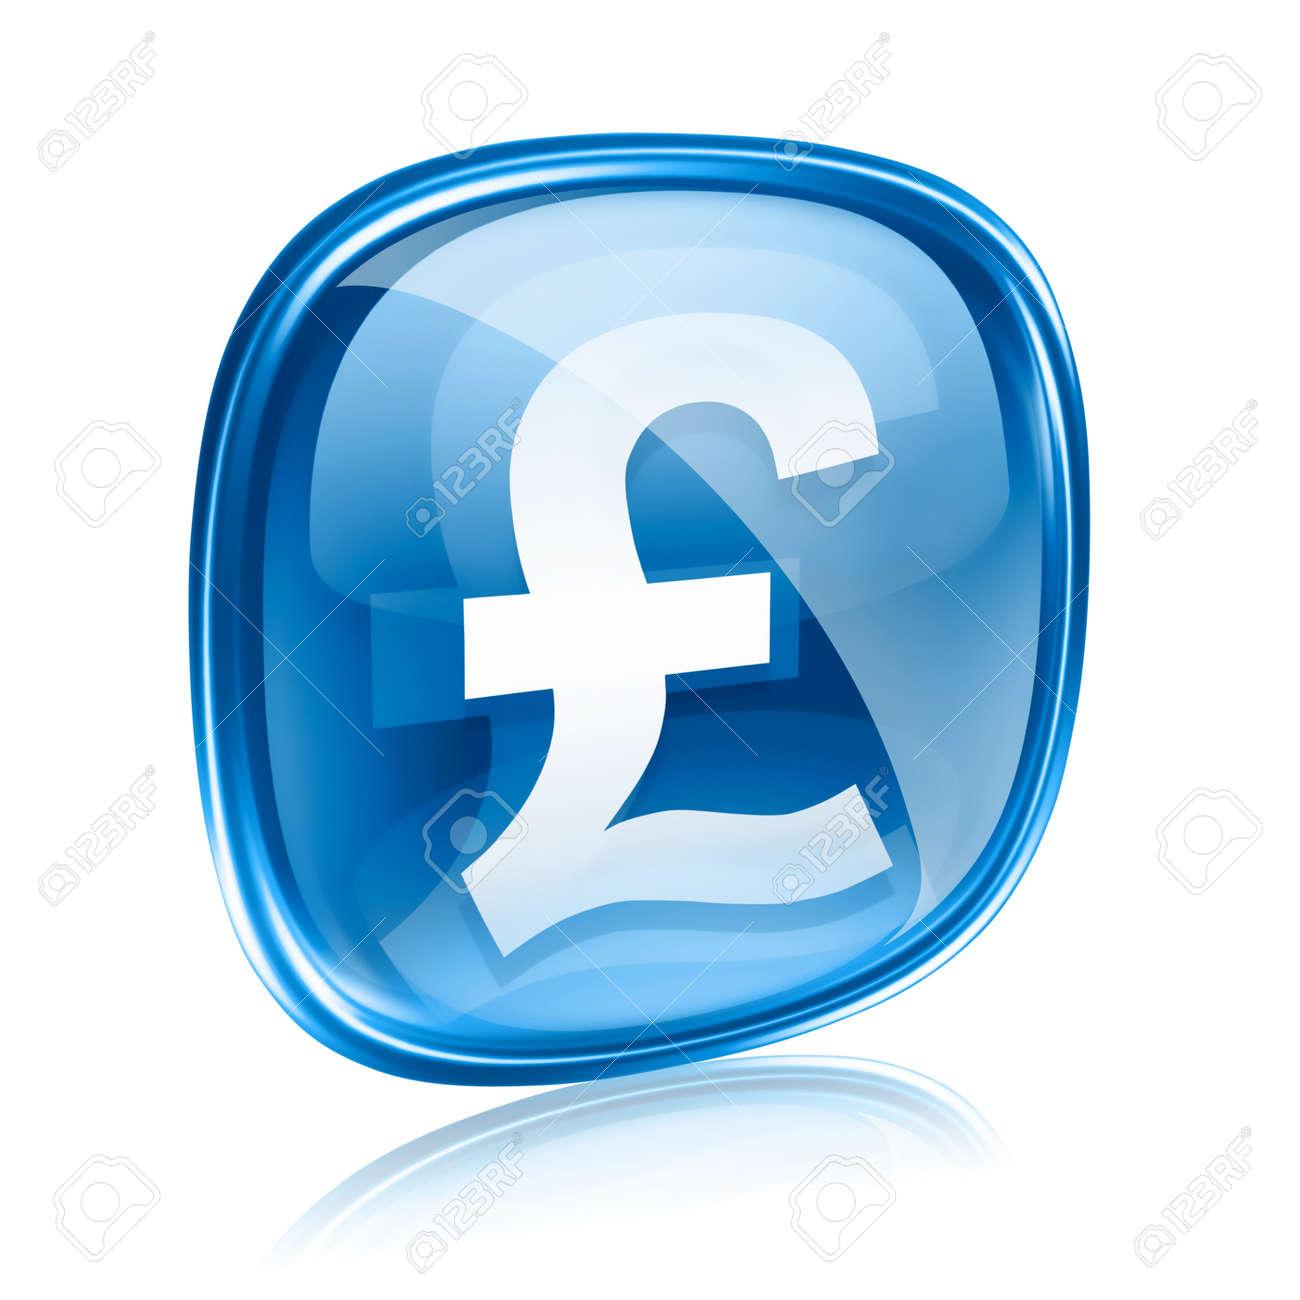 Pound icon blue glass, isolated on white background - 11769024